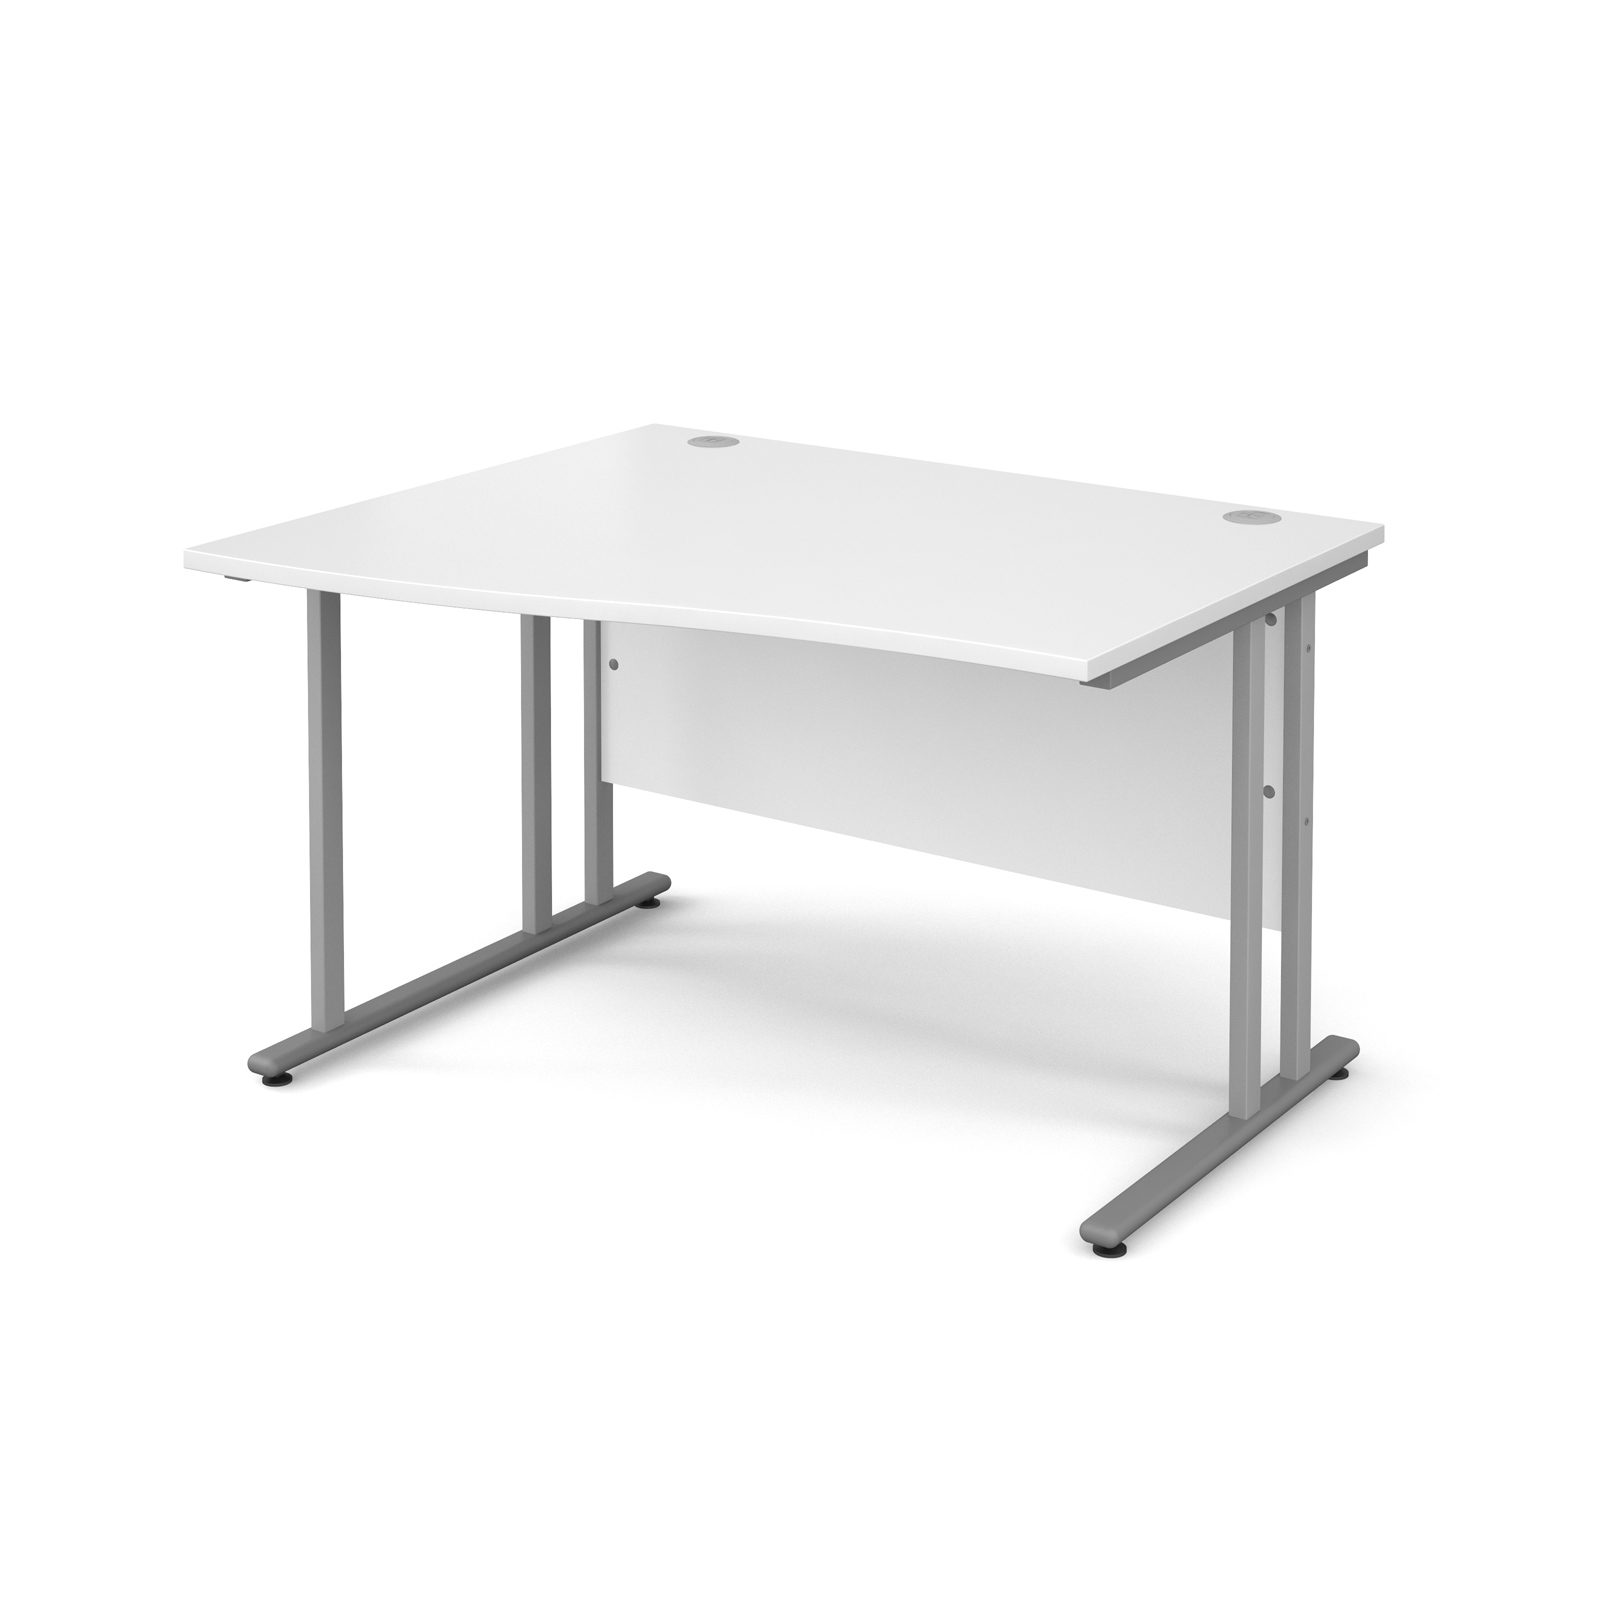 Maestro 25 Sl Left Hand Wave Desk 1200mm Silver Cantilever Frame White Top